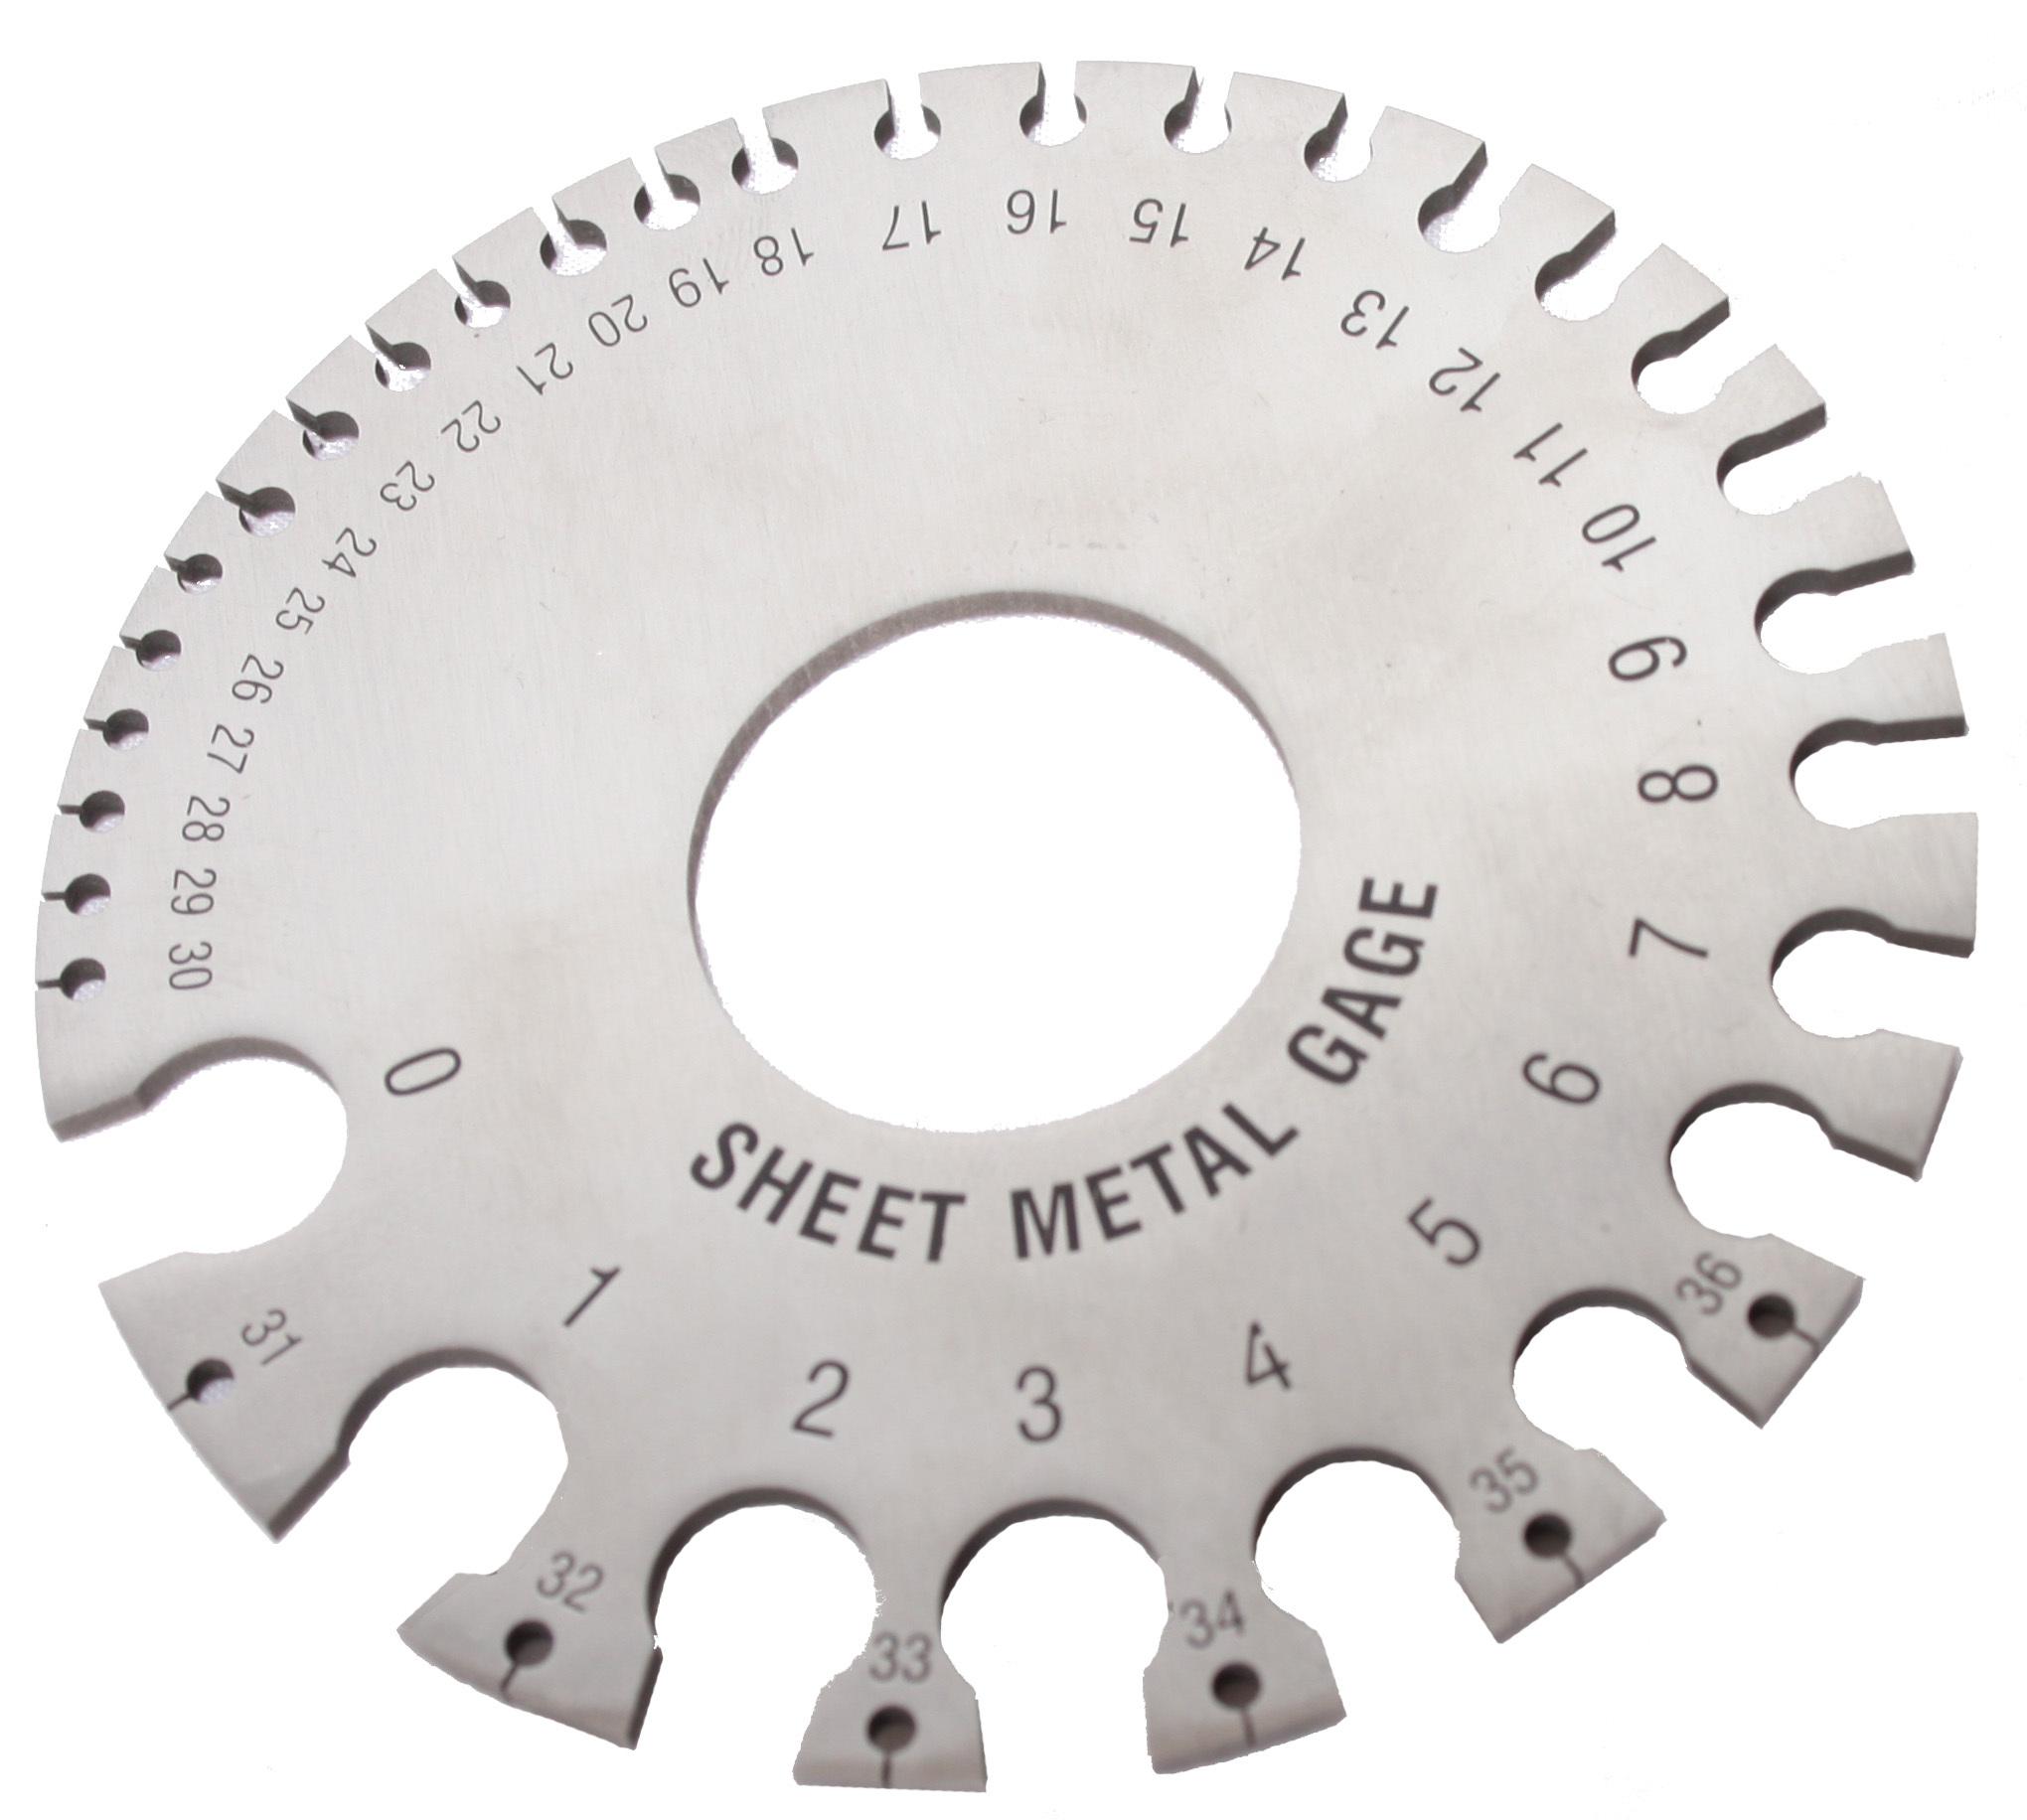 Woodward Fab Sheet Metal Thickness Ga uge